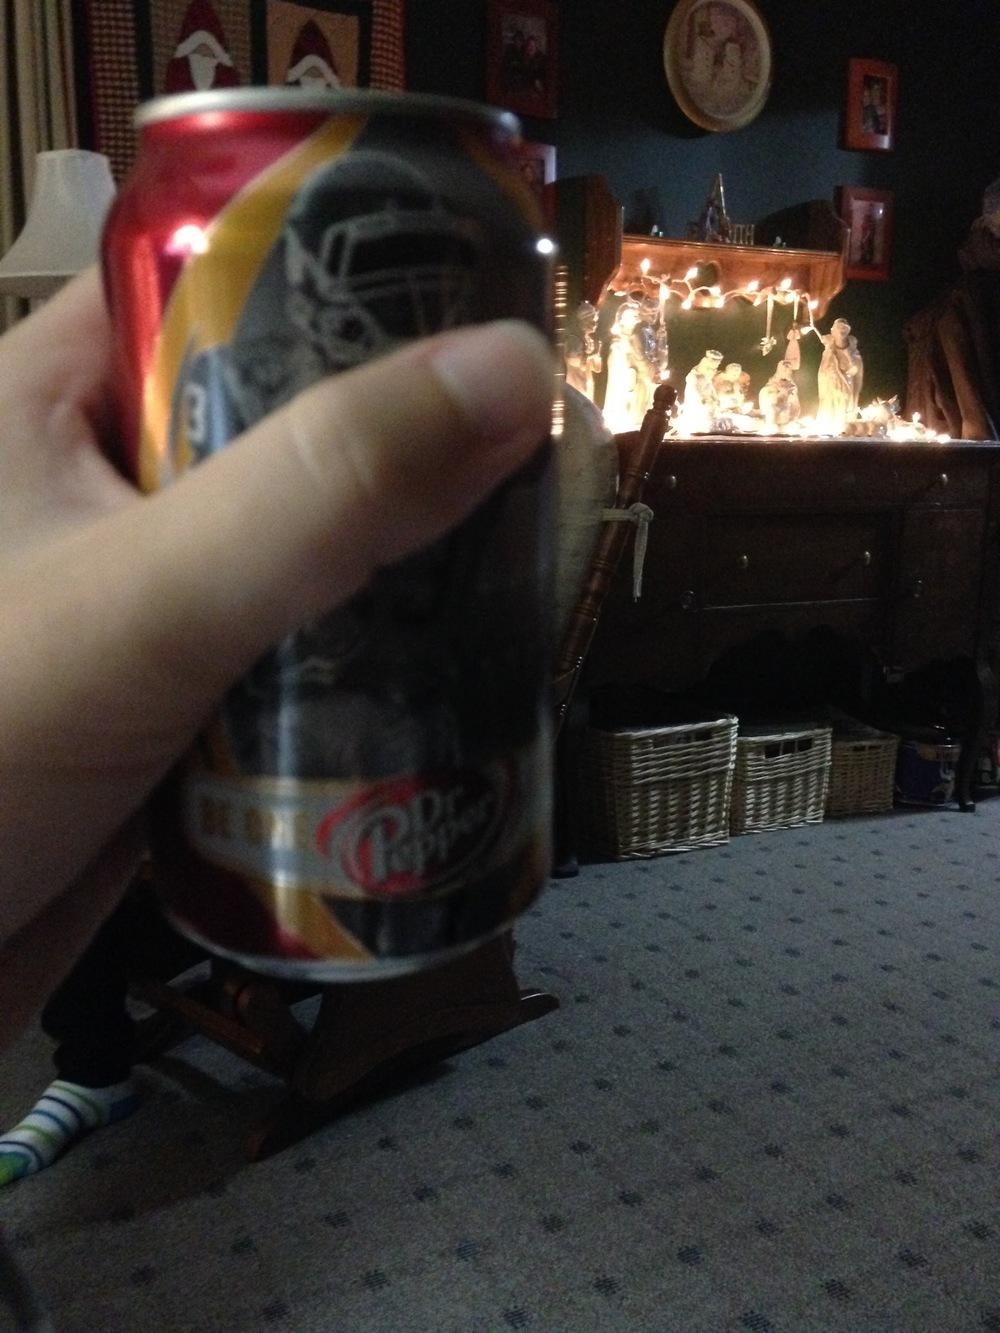 Dr-Pepper-and-Nativity.jpg